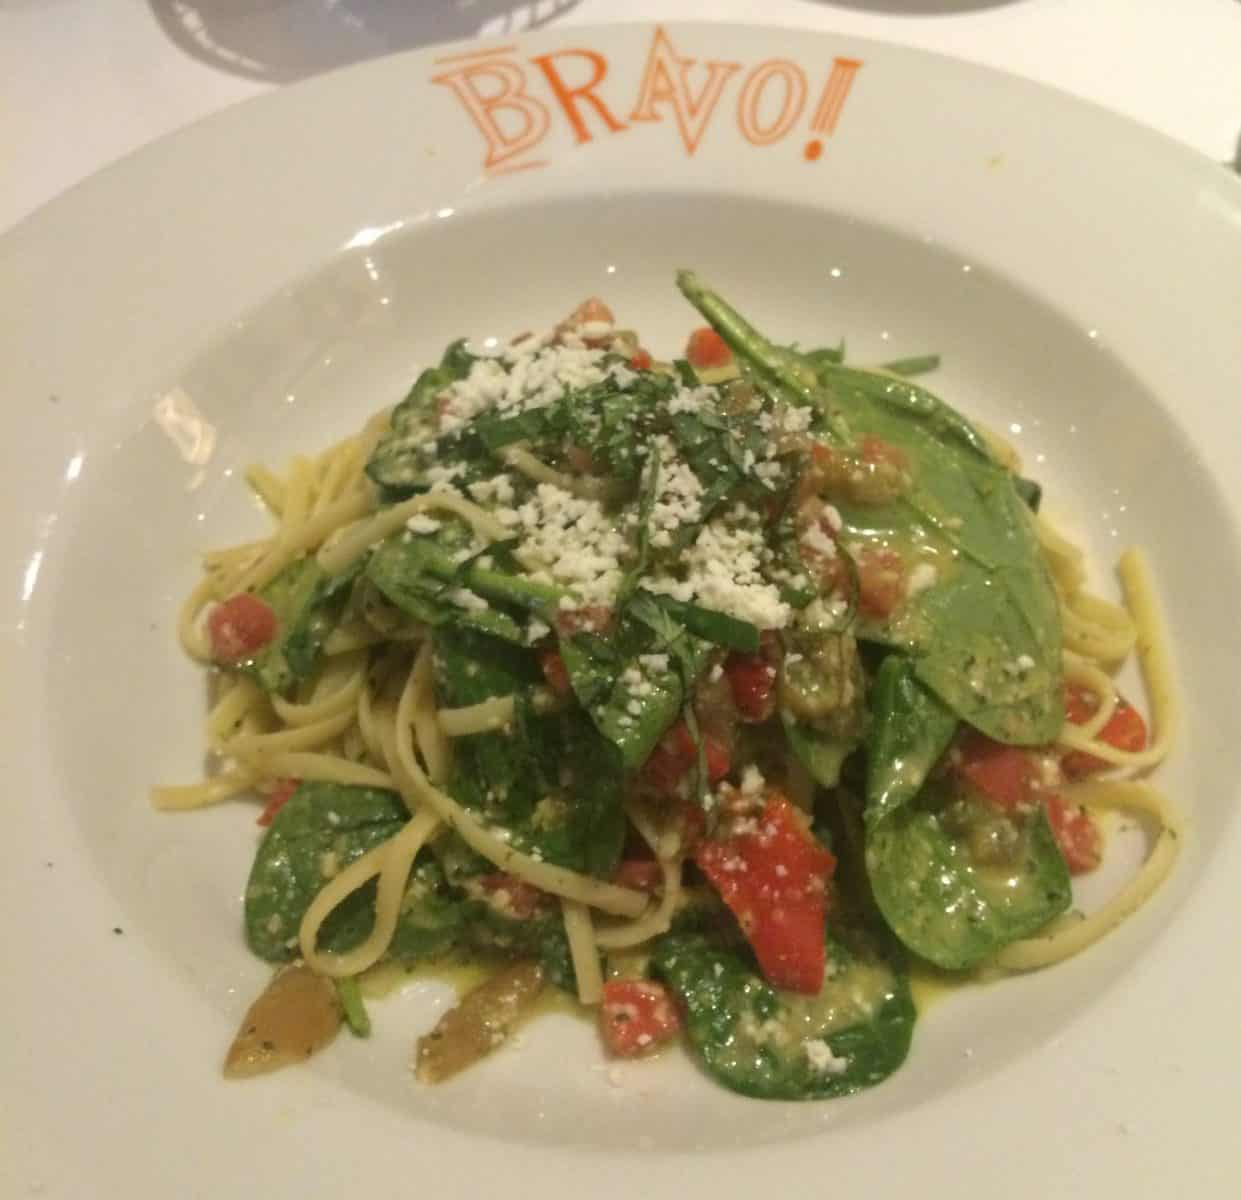 Bravo cucina italiana briarwood mall review a2withkids for Cucina italiana